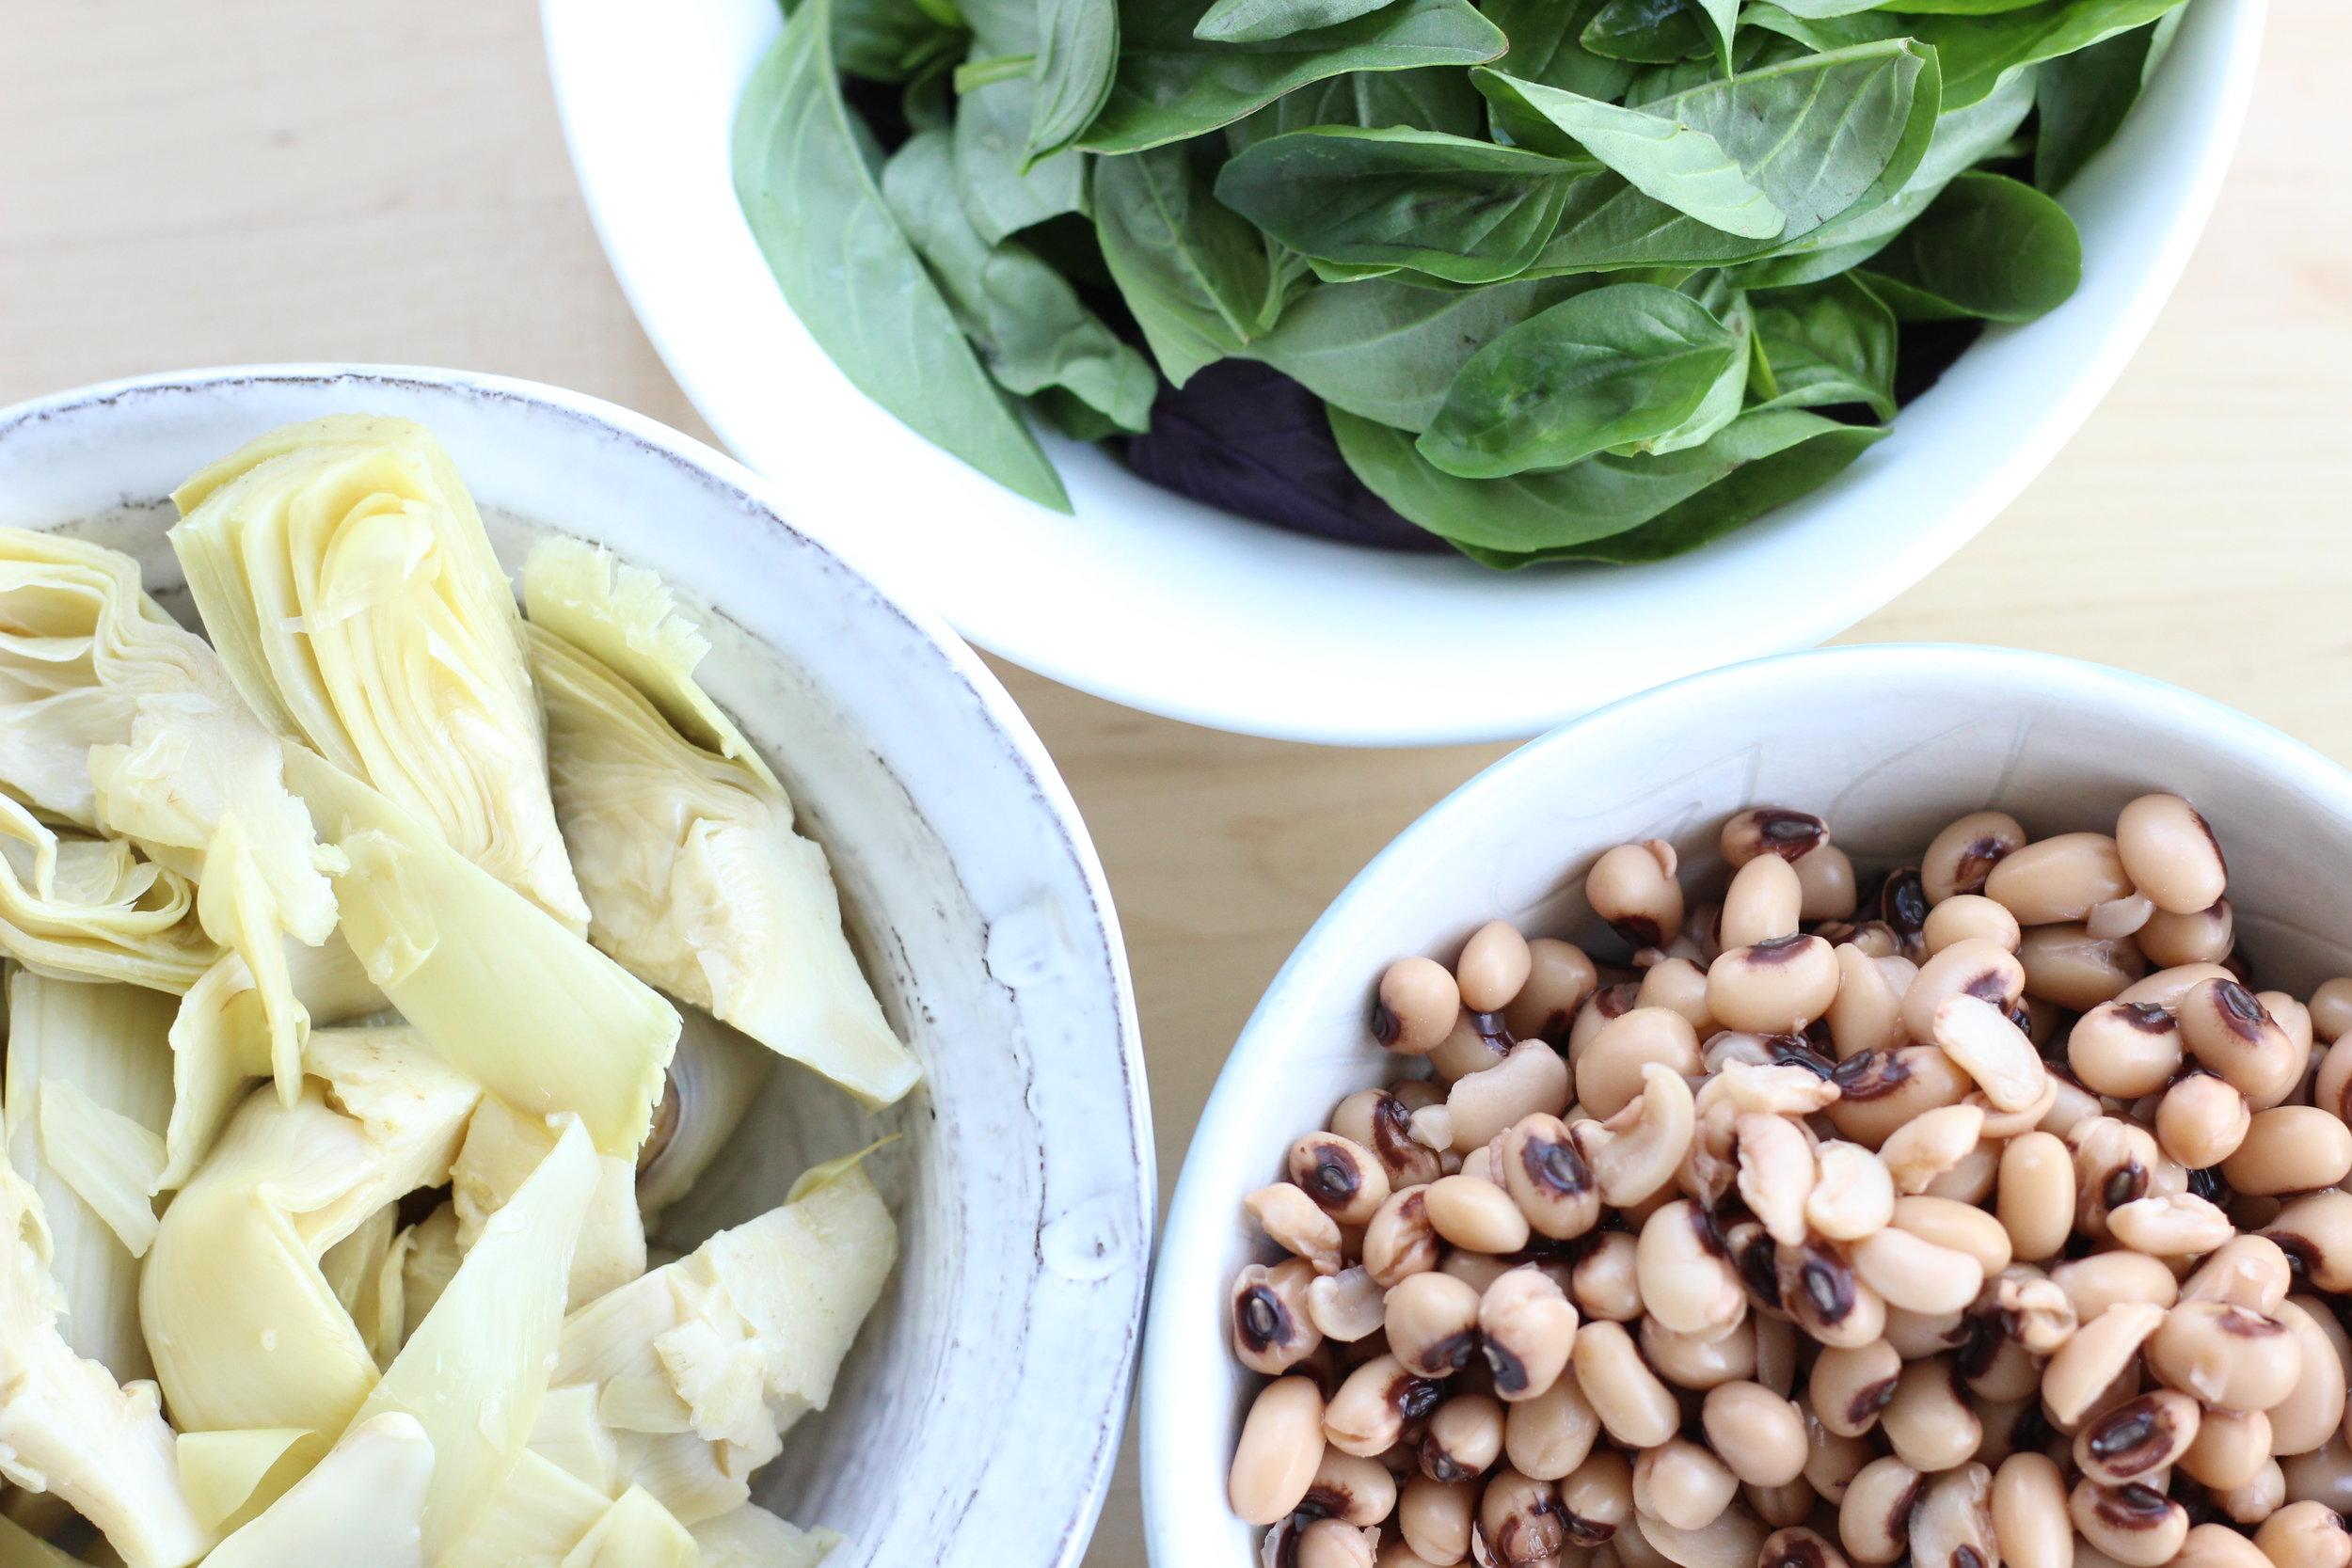 Eggplant zucchini fresh basil cheezy pasta ingredients bowls 4.jpg